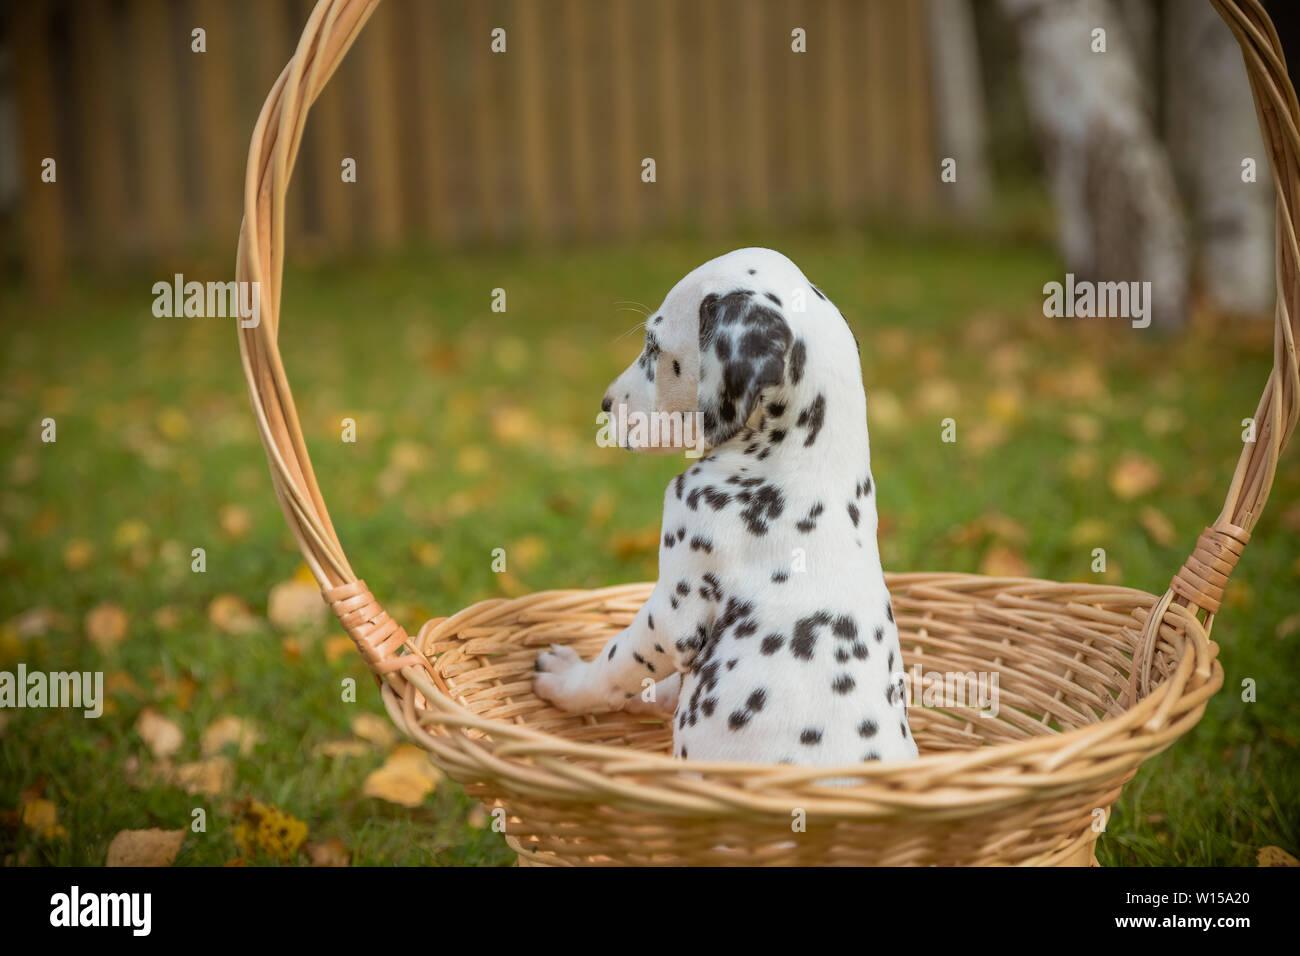 Adorable dalmatian dog outdoors in summer, autumn Dalmatian